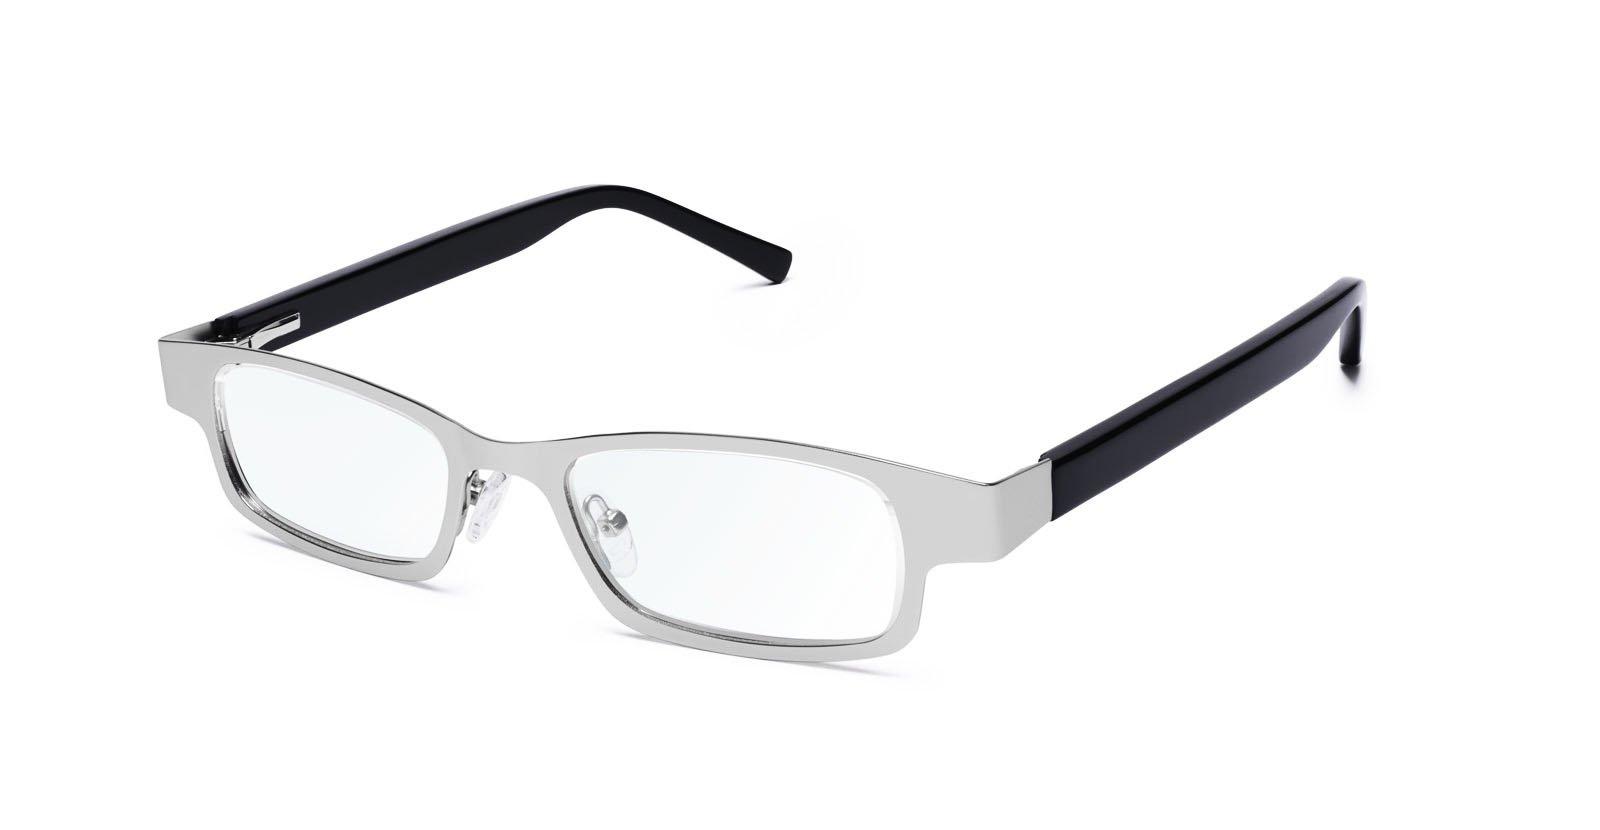 Eyejusters, Self-Adjustable Glasses, Combination, Sliver & Black